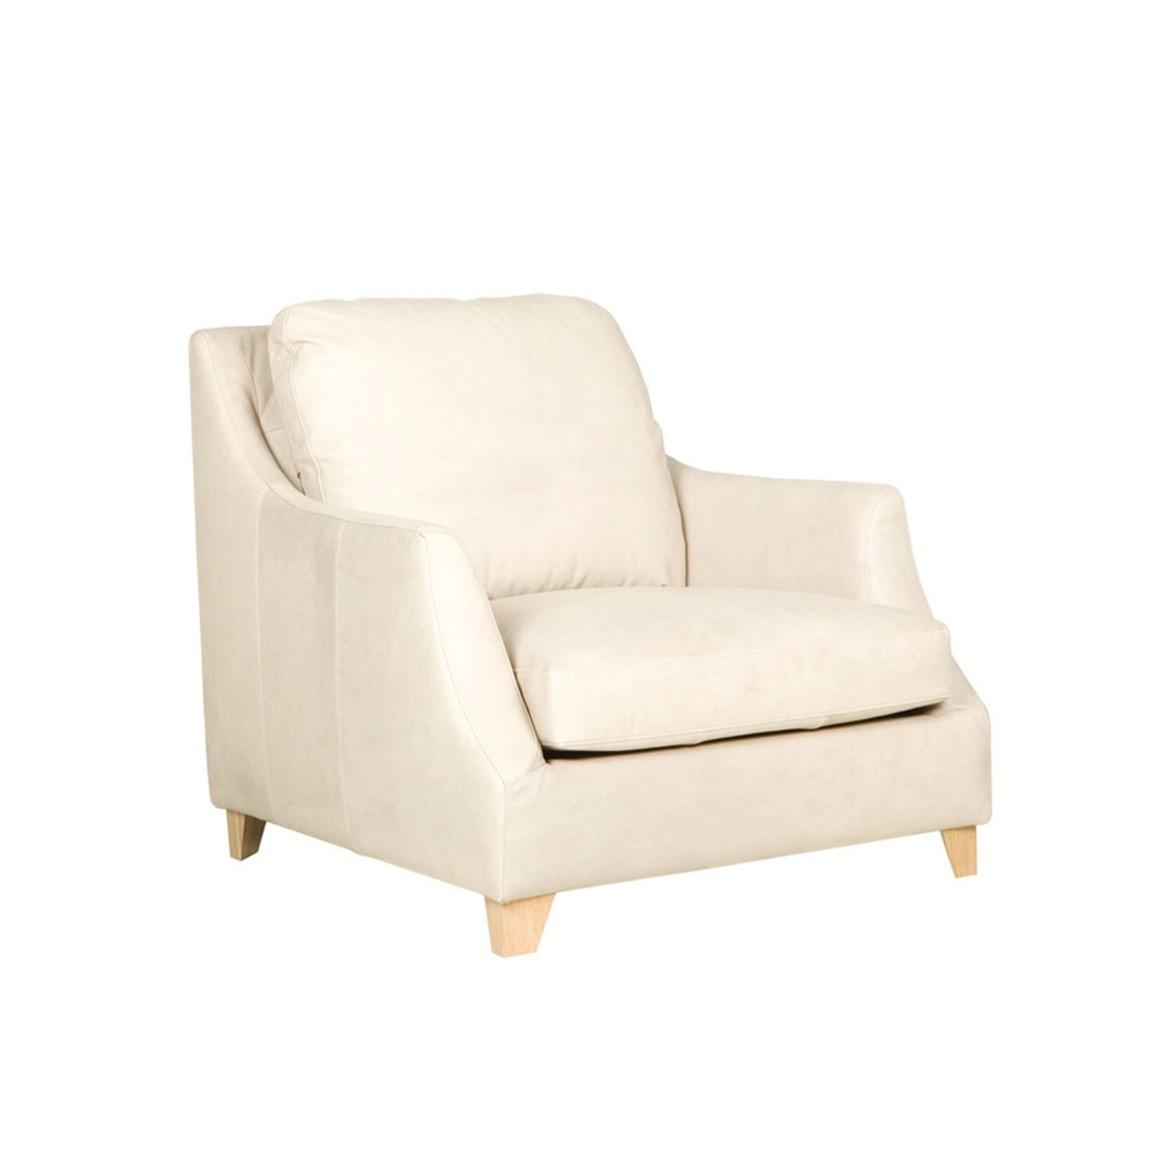 Monterey armchair low - 85 cm